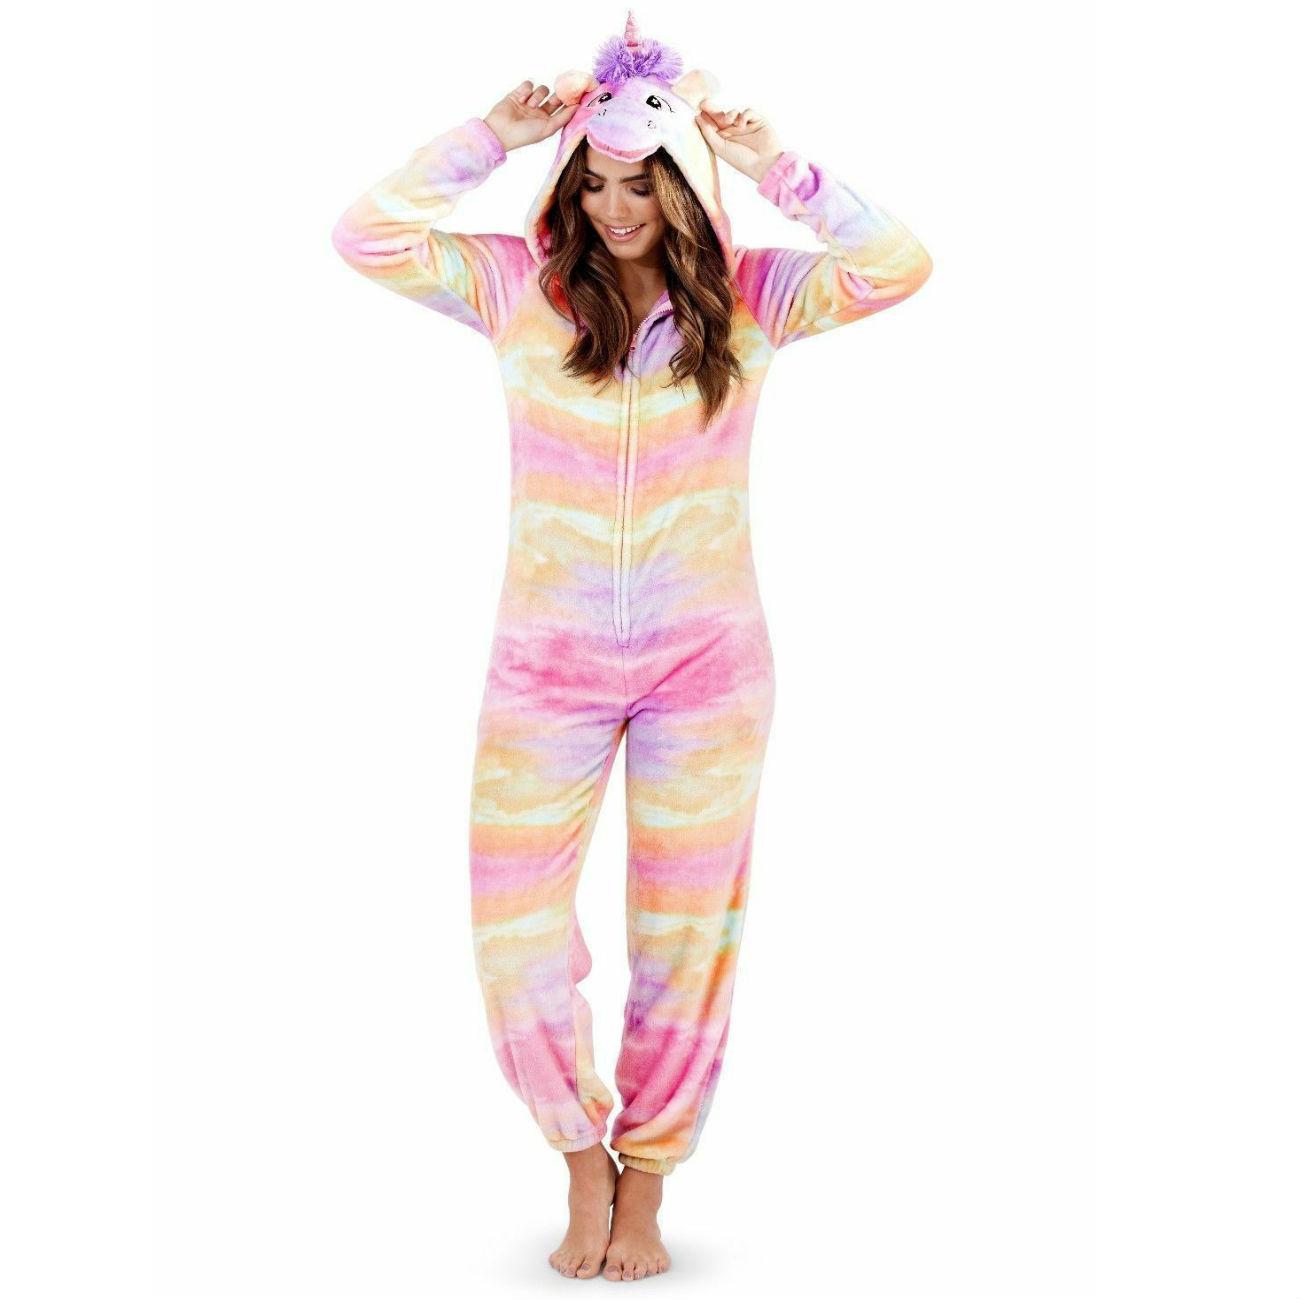 Loungeable Boutique Girls Bright Rainbow Soft Fleece Novelty Unicorn Hood Bath Robe in 3 UK Kids Sizes